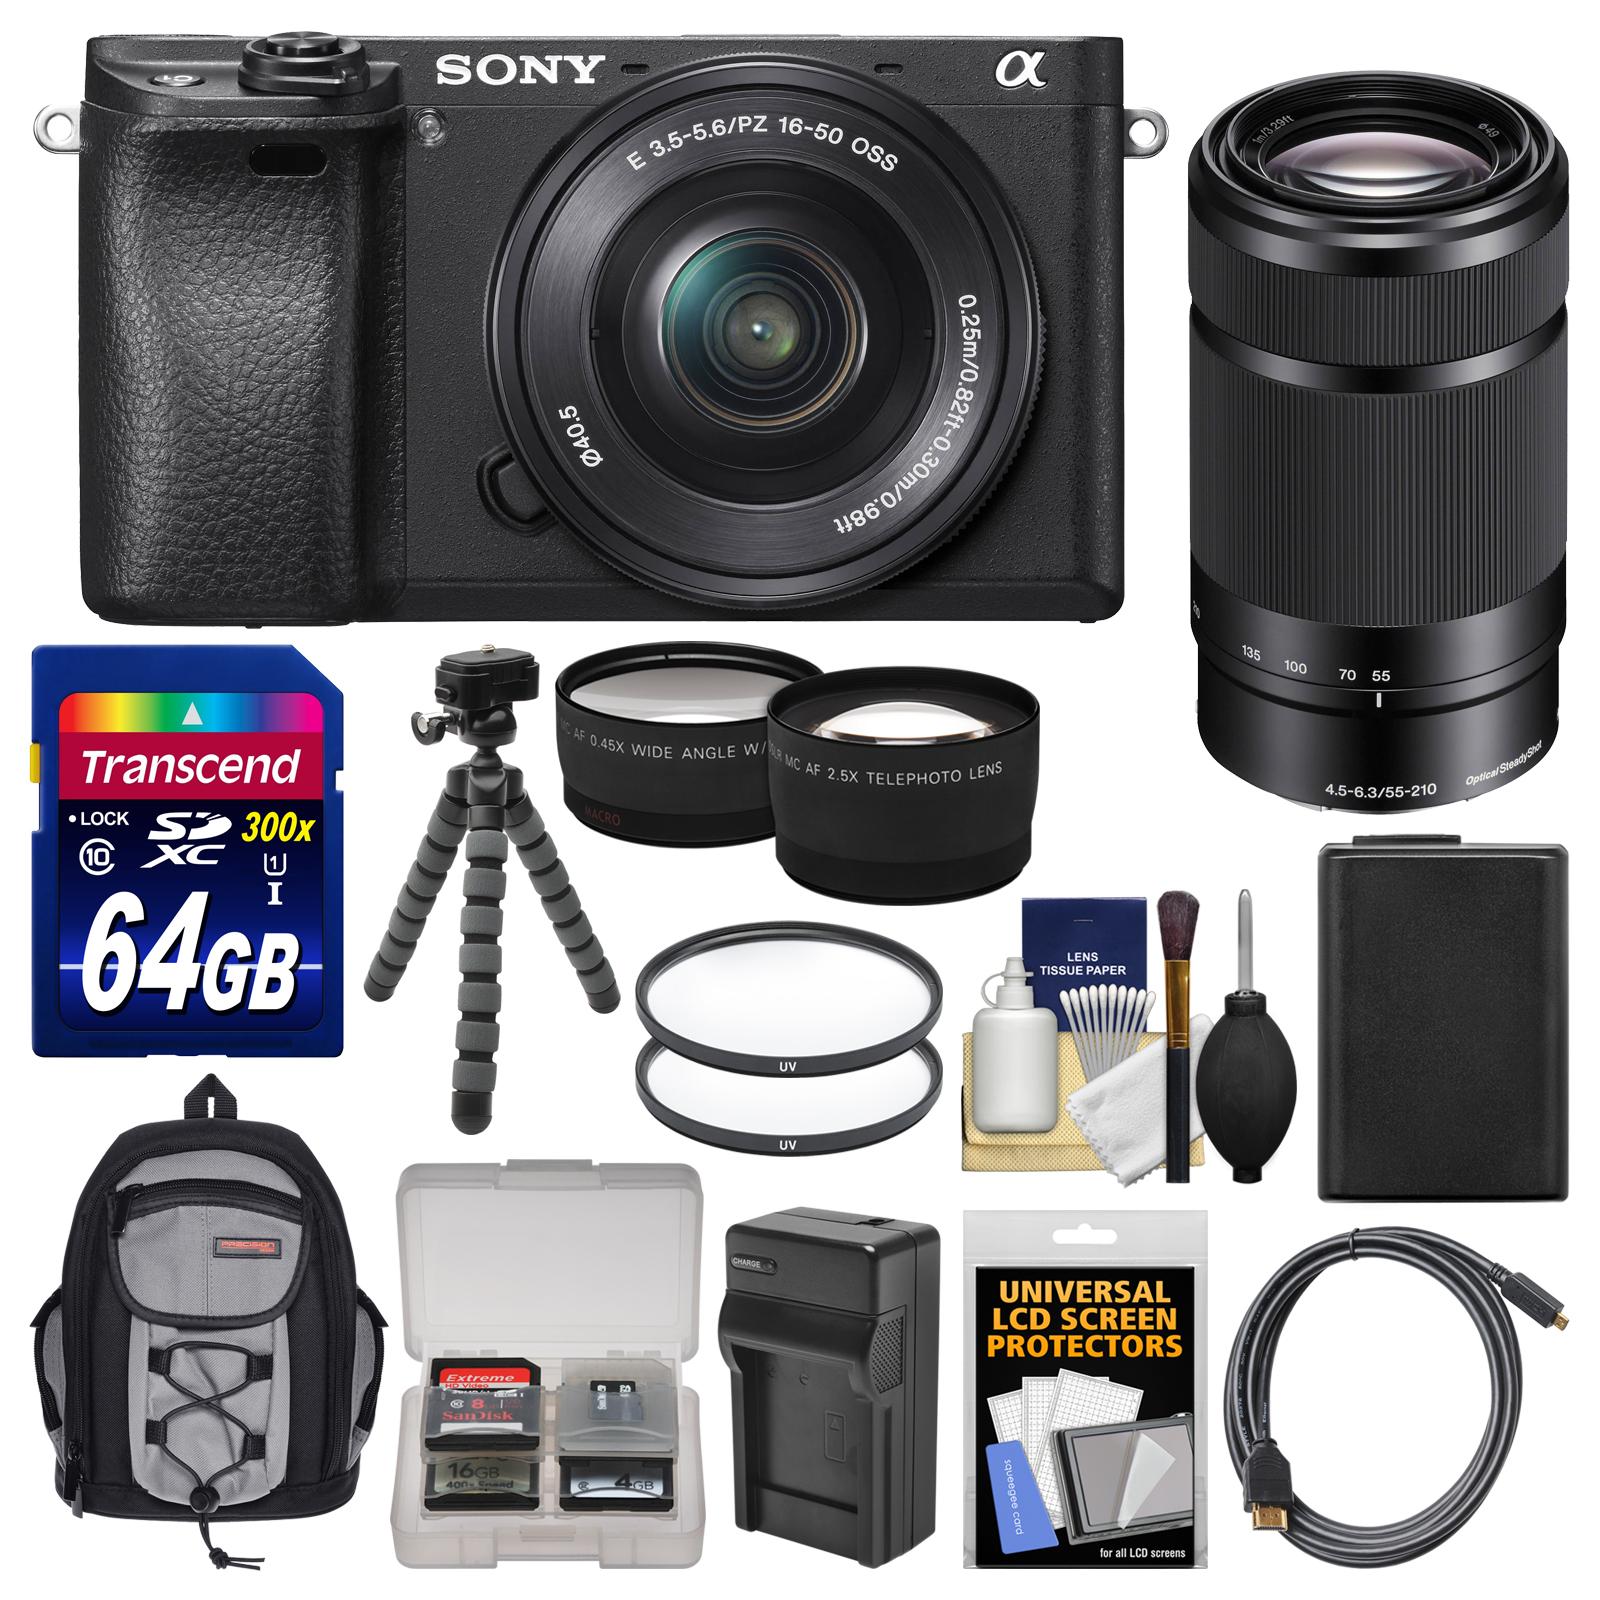 sony alpha a6300 4k wi fi digital camera & 16 50mm with 55